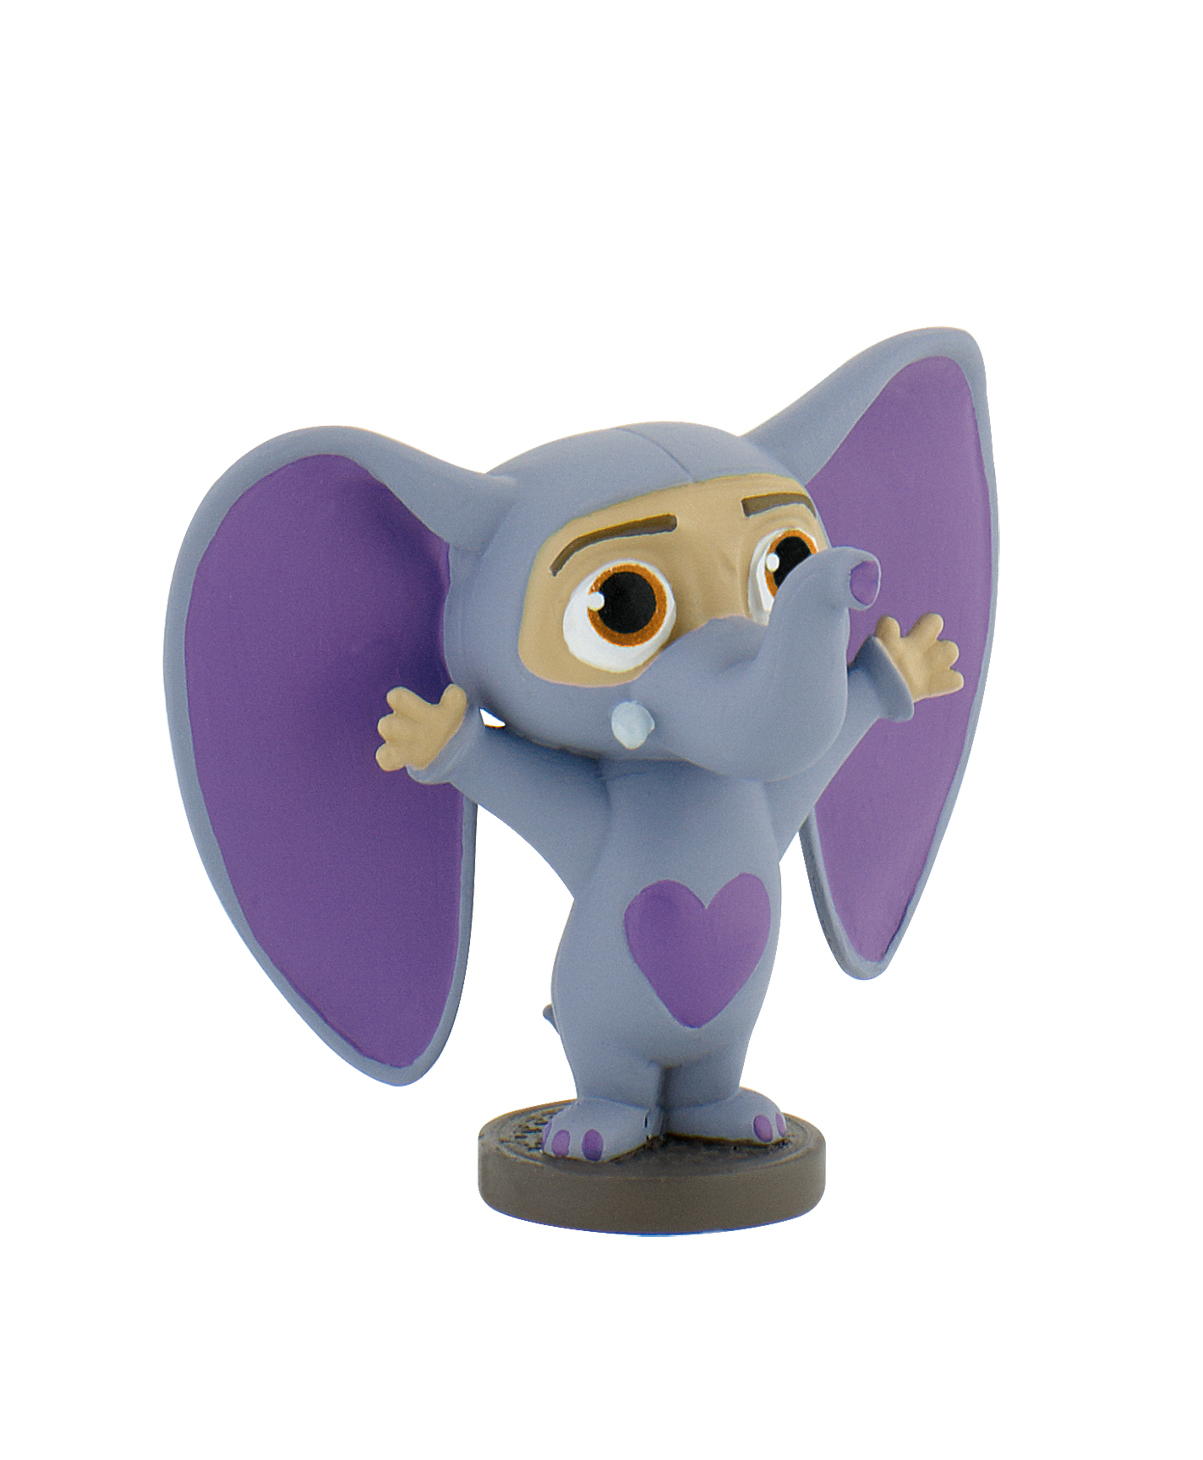 Figurine Zootopie Disney - Finnick - 7 cm